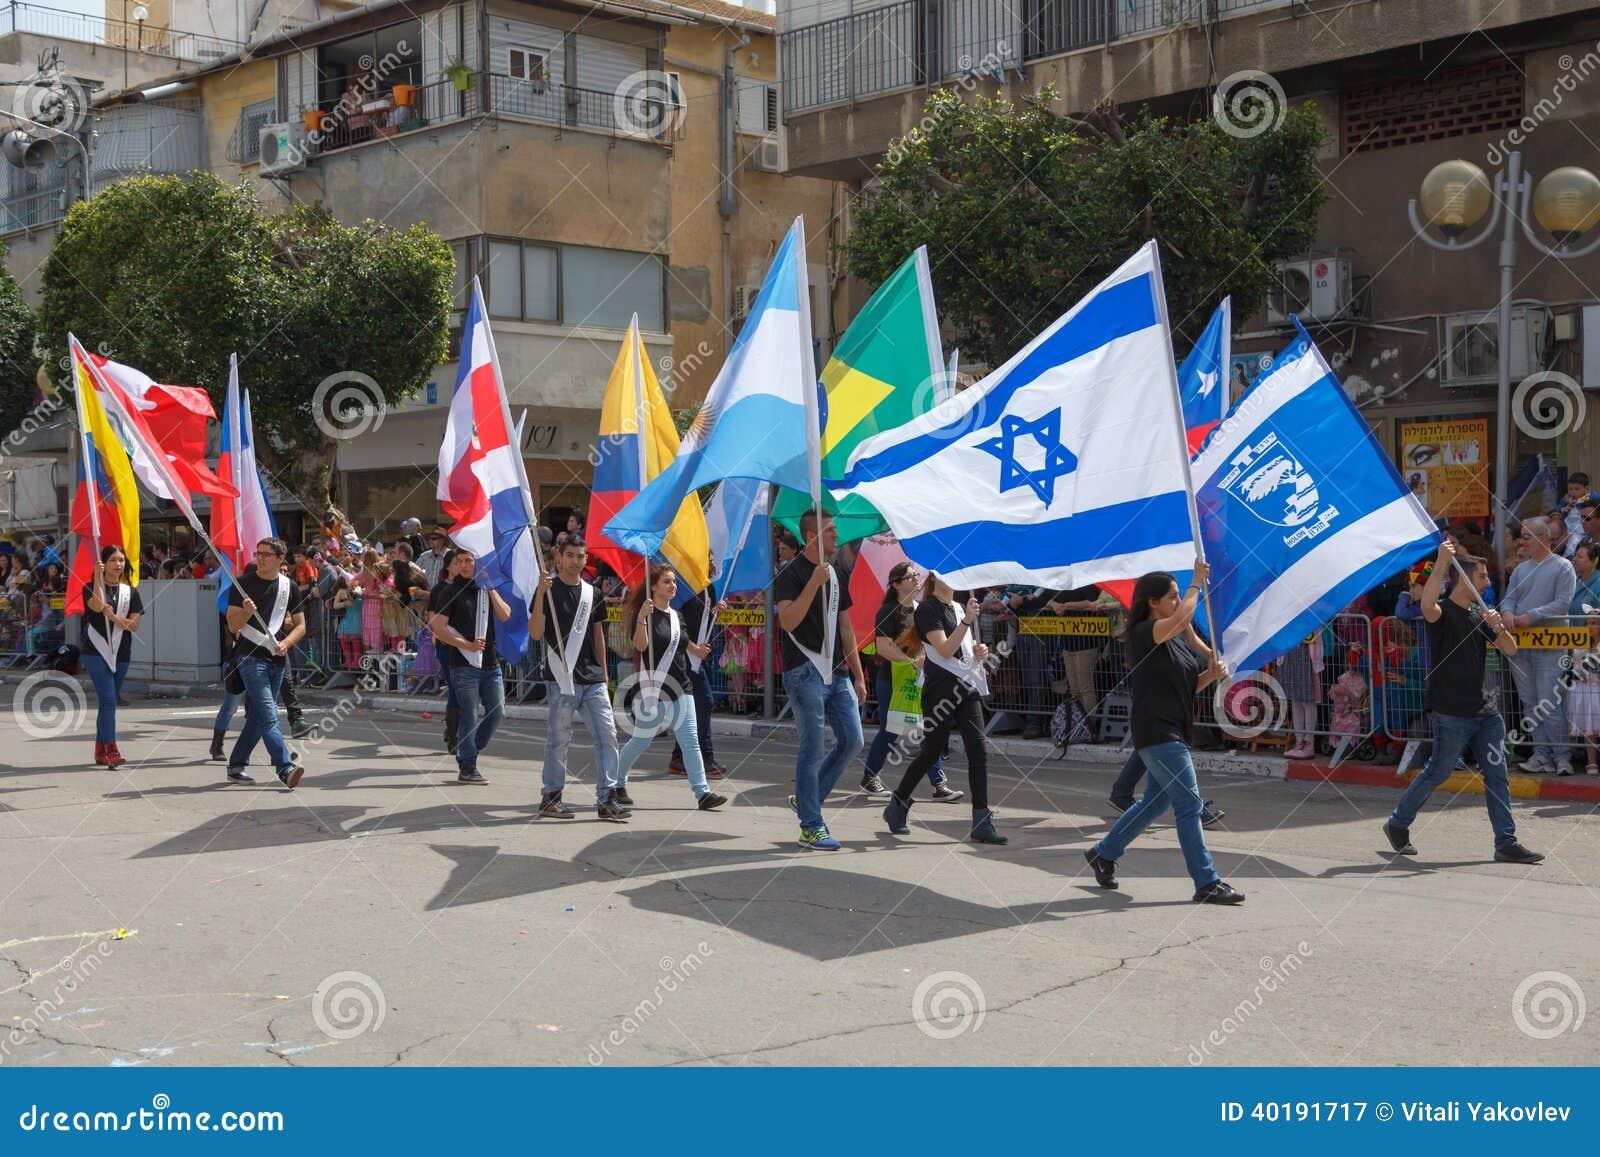 Adloyada Holon. Carnaval de Purim. Israel